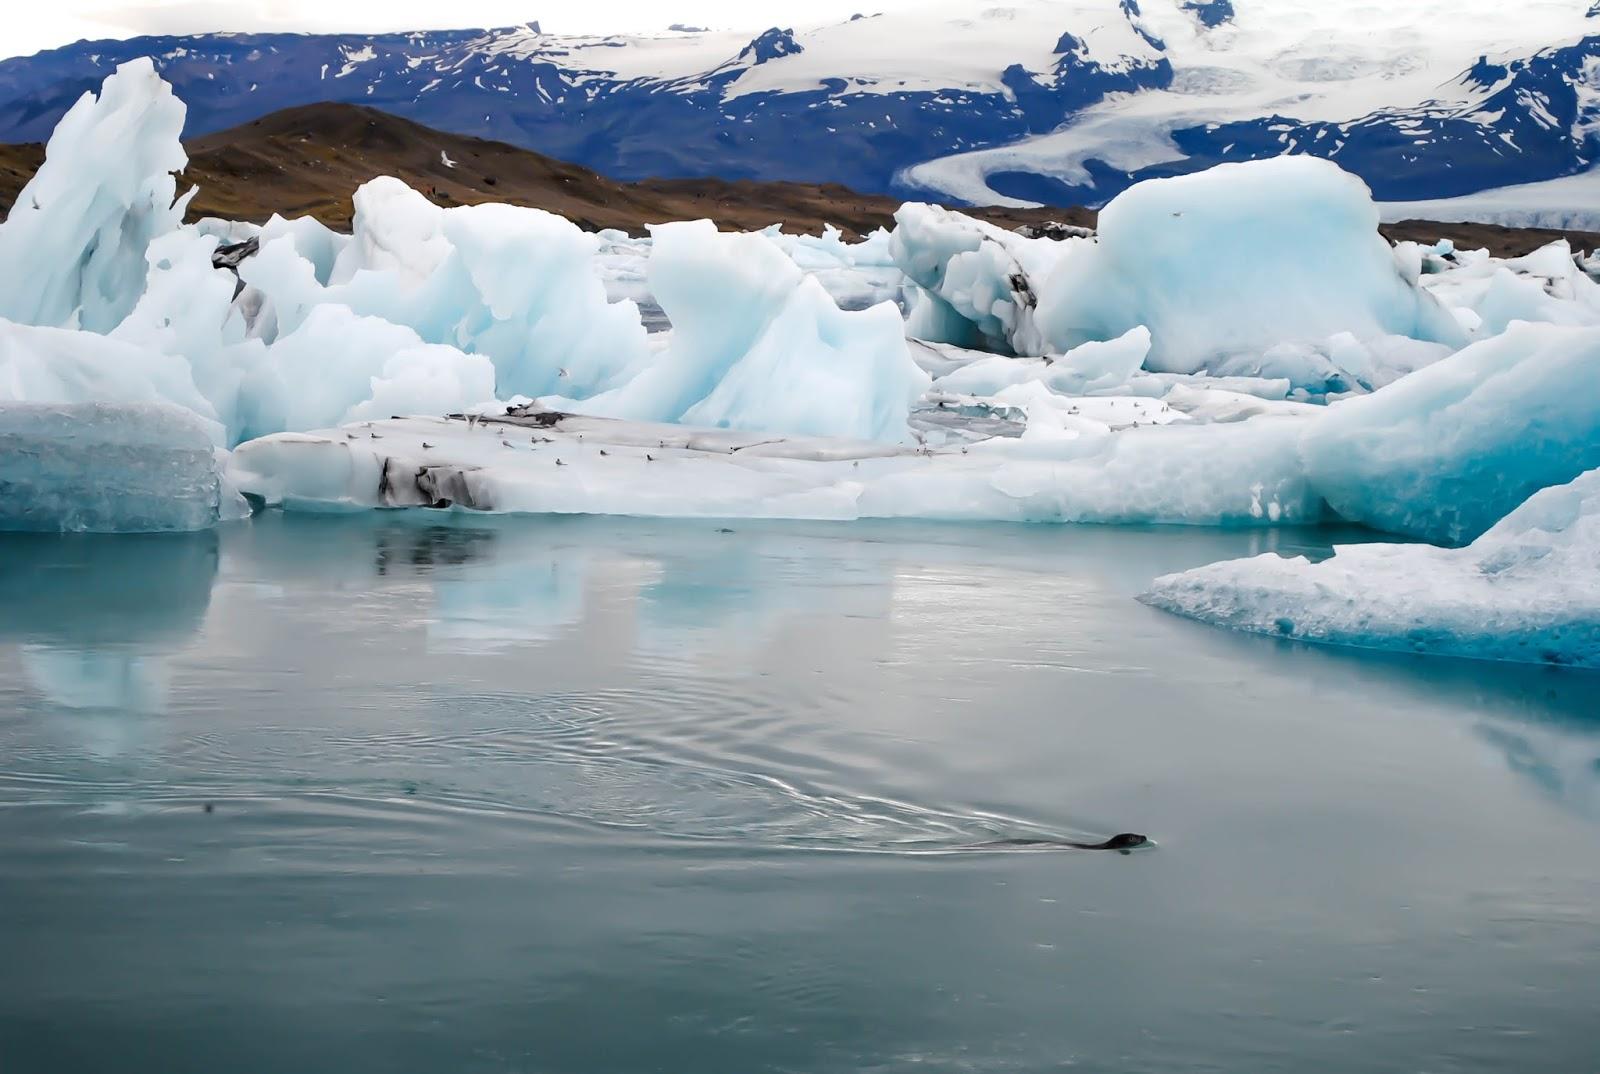 Seal swimming among Icebergs in Jökulsárlón Glacier Lagoon in Iceland